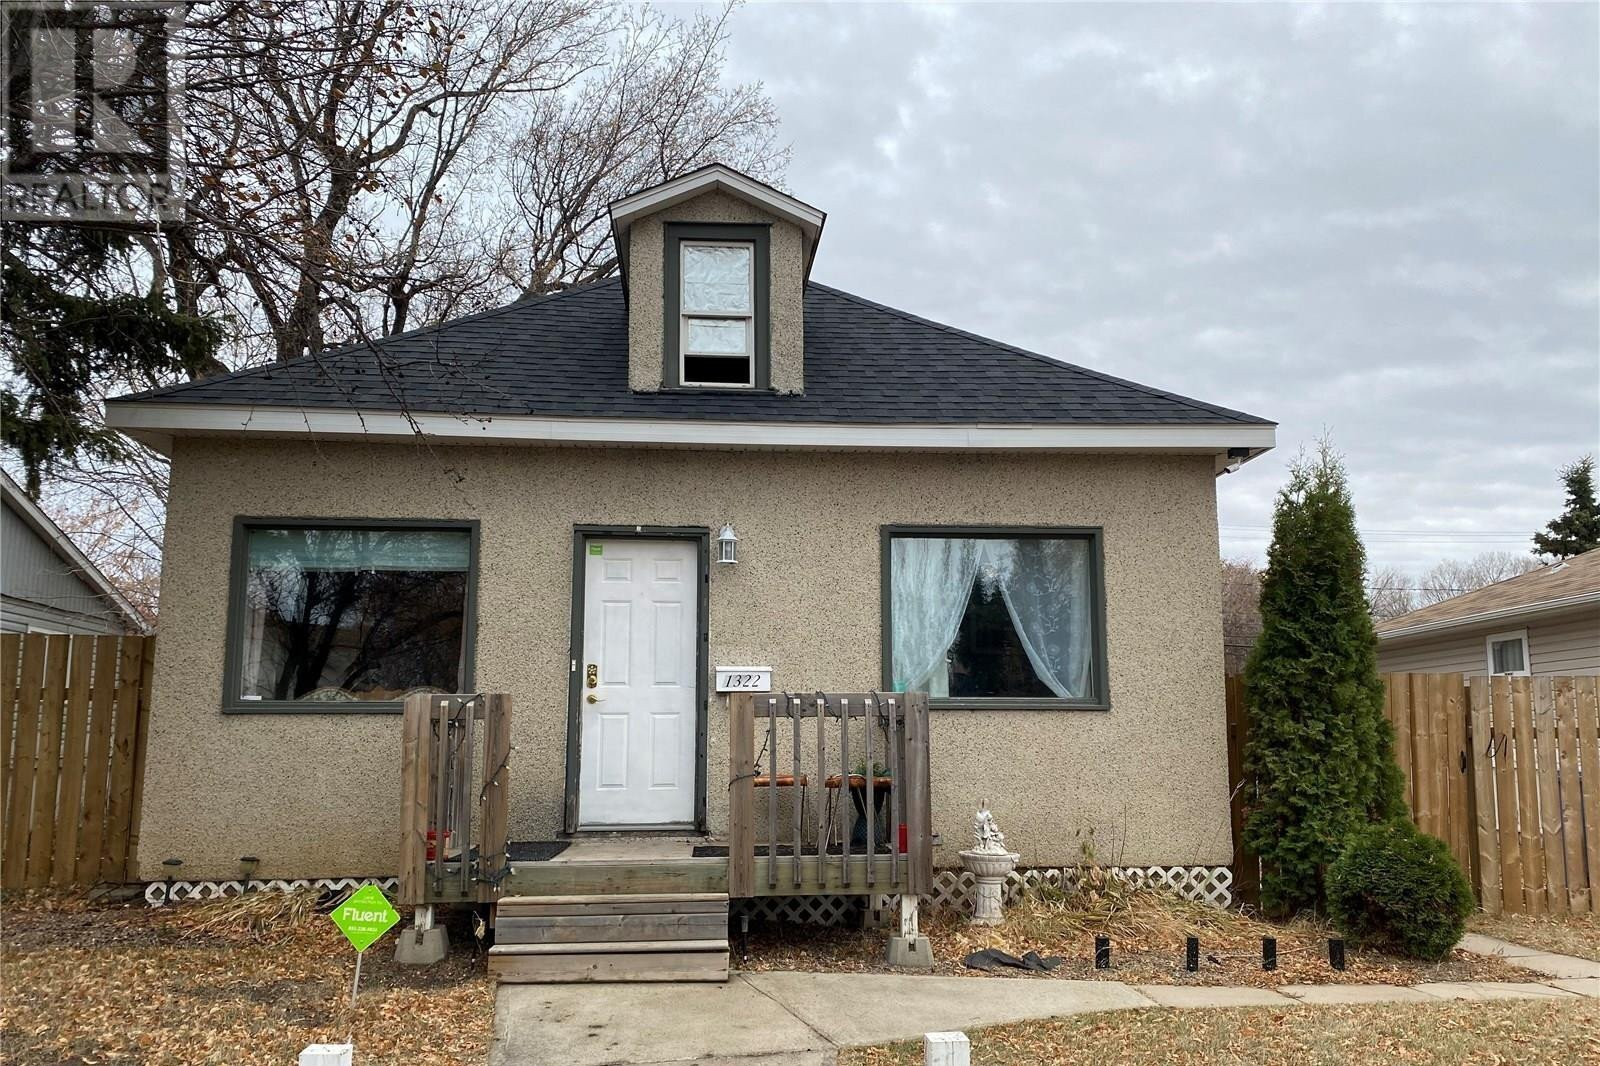 House for sale at 1322 105th St North Battleford Saskatchewan - MLS: SK831493